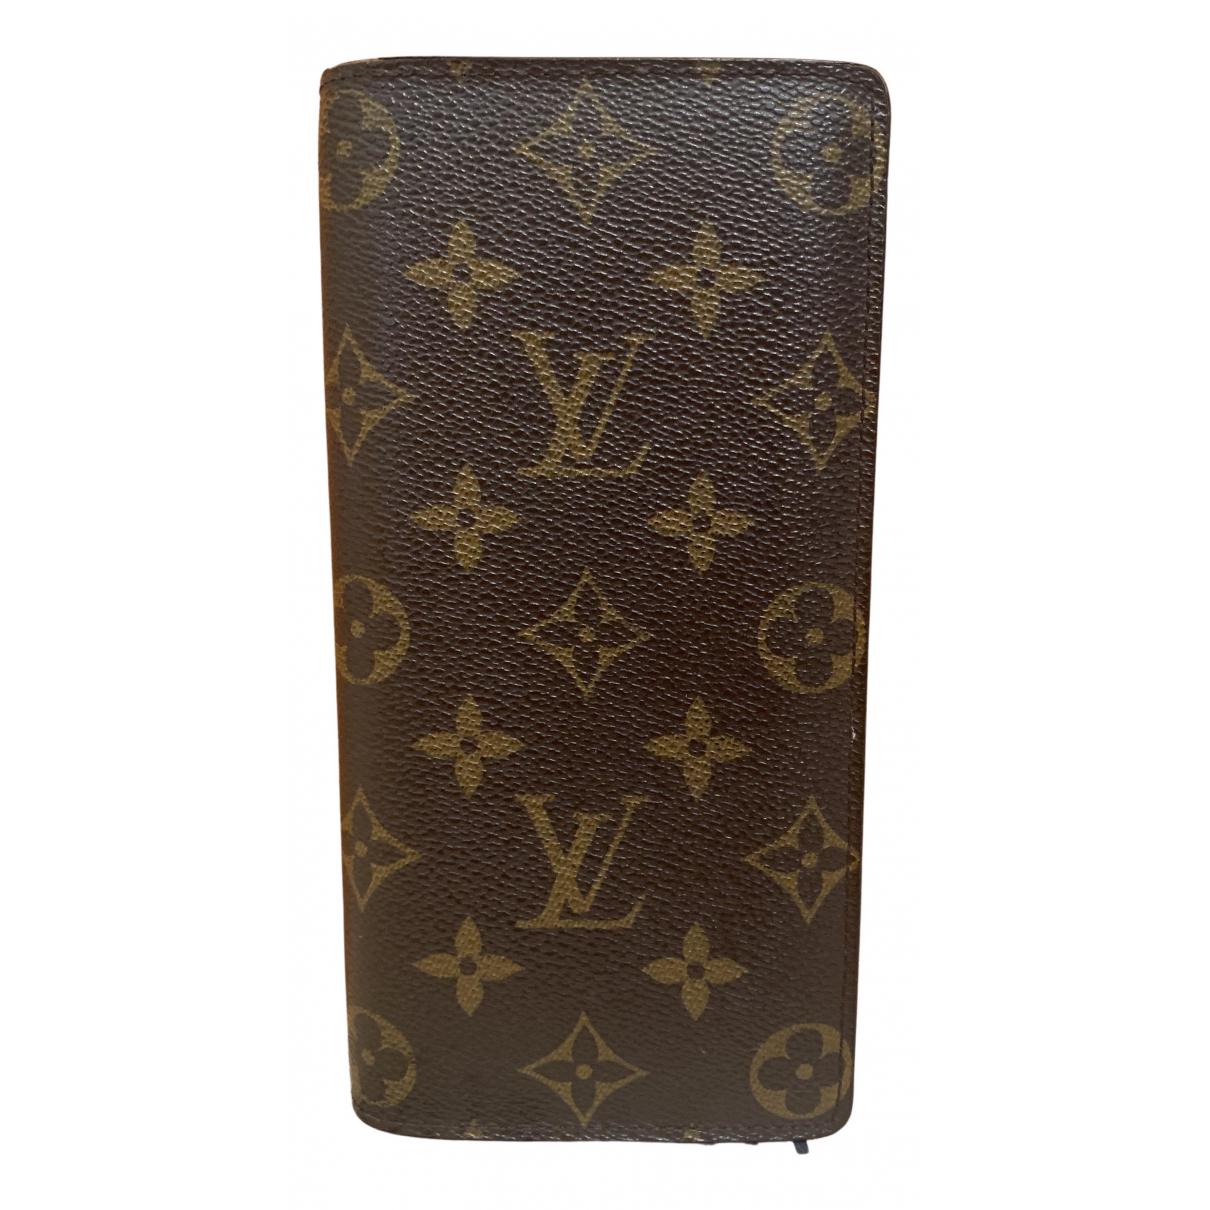 Marroquineria Brazza de Lona Louis Vuitton